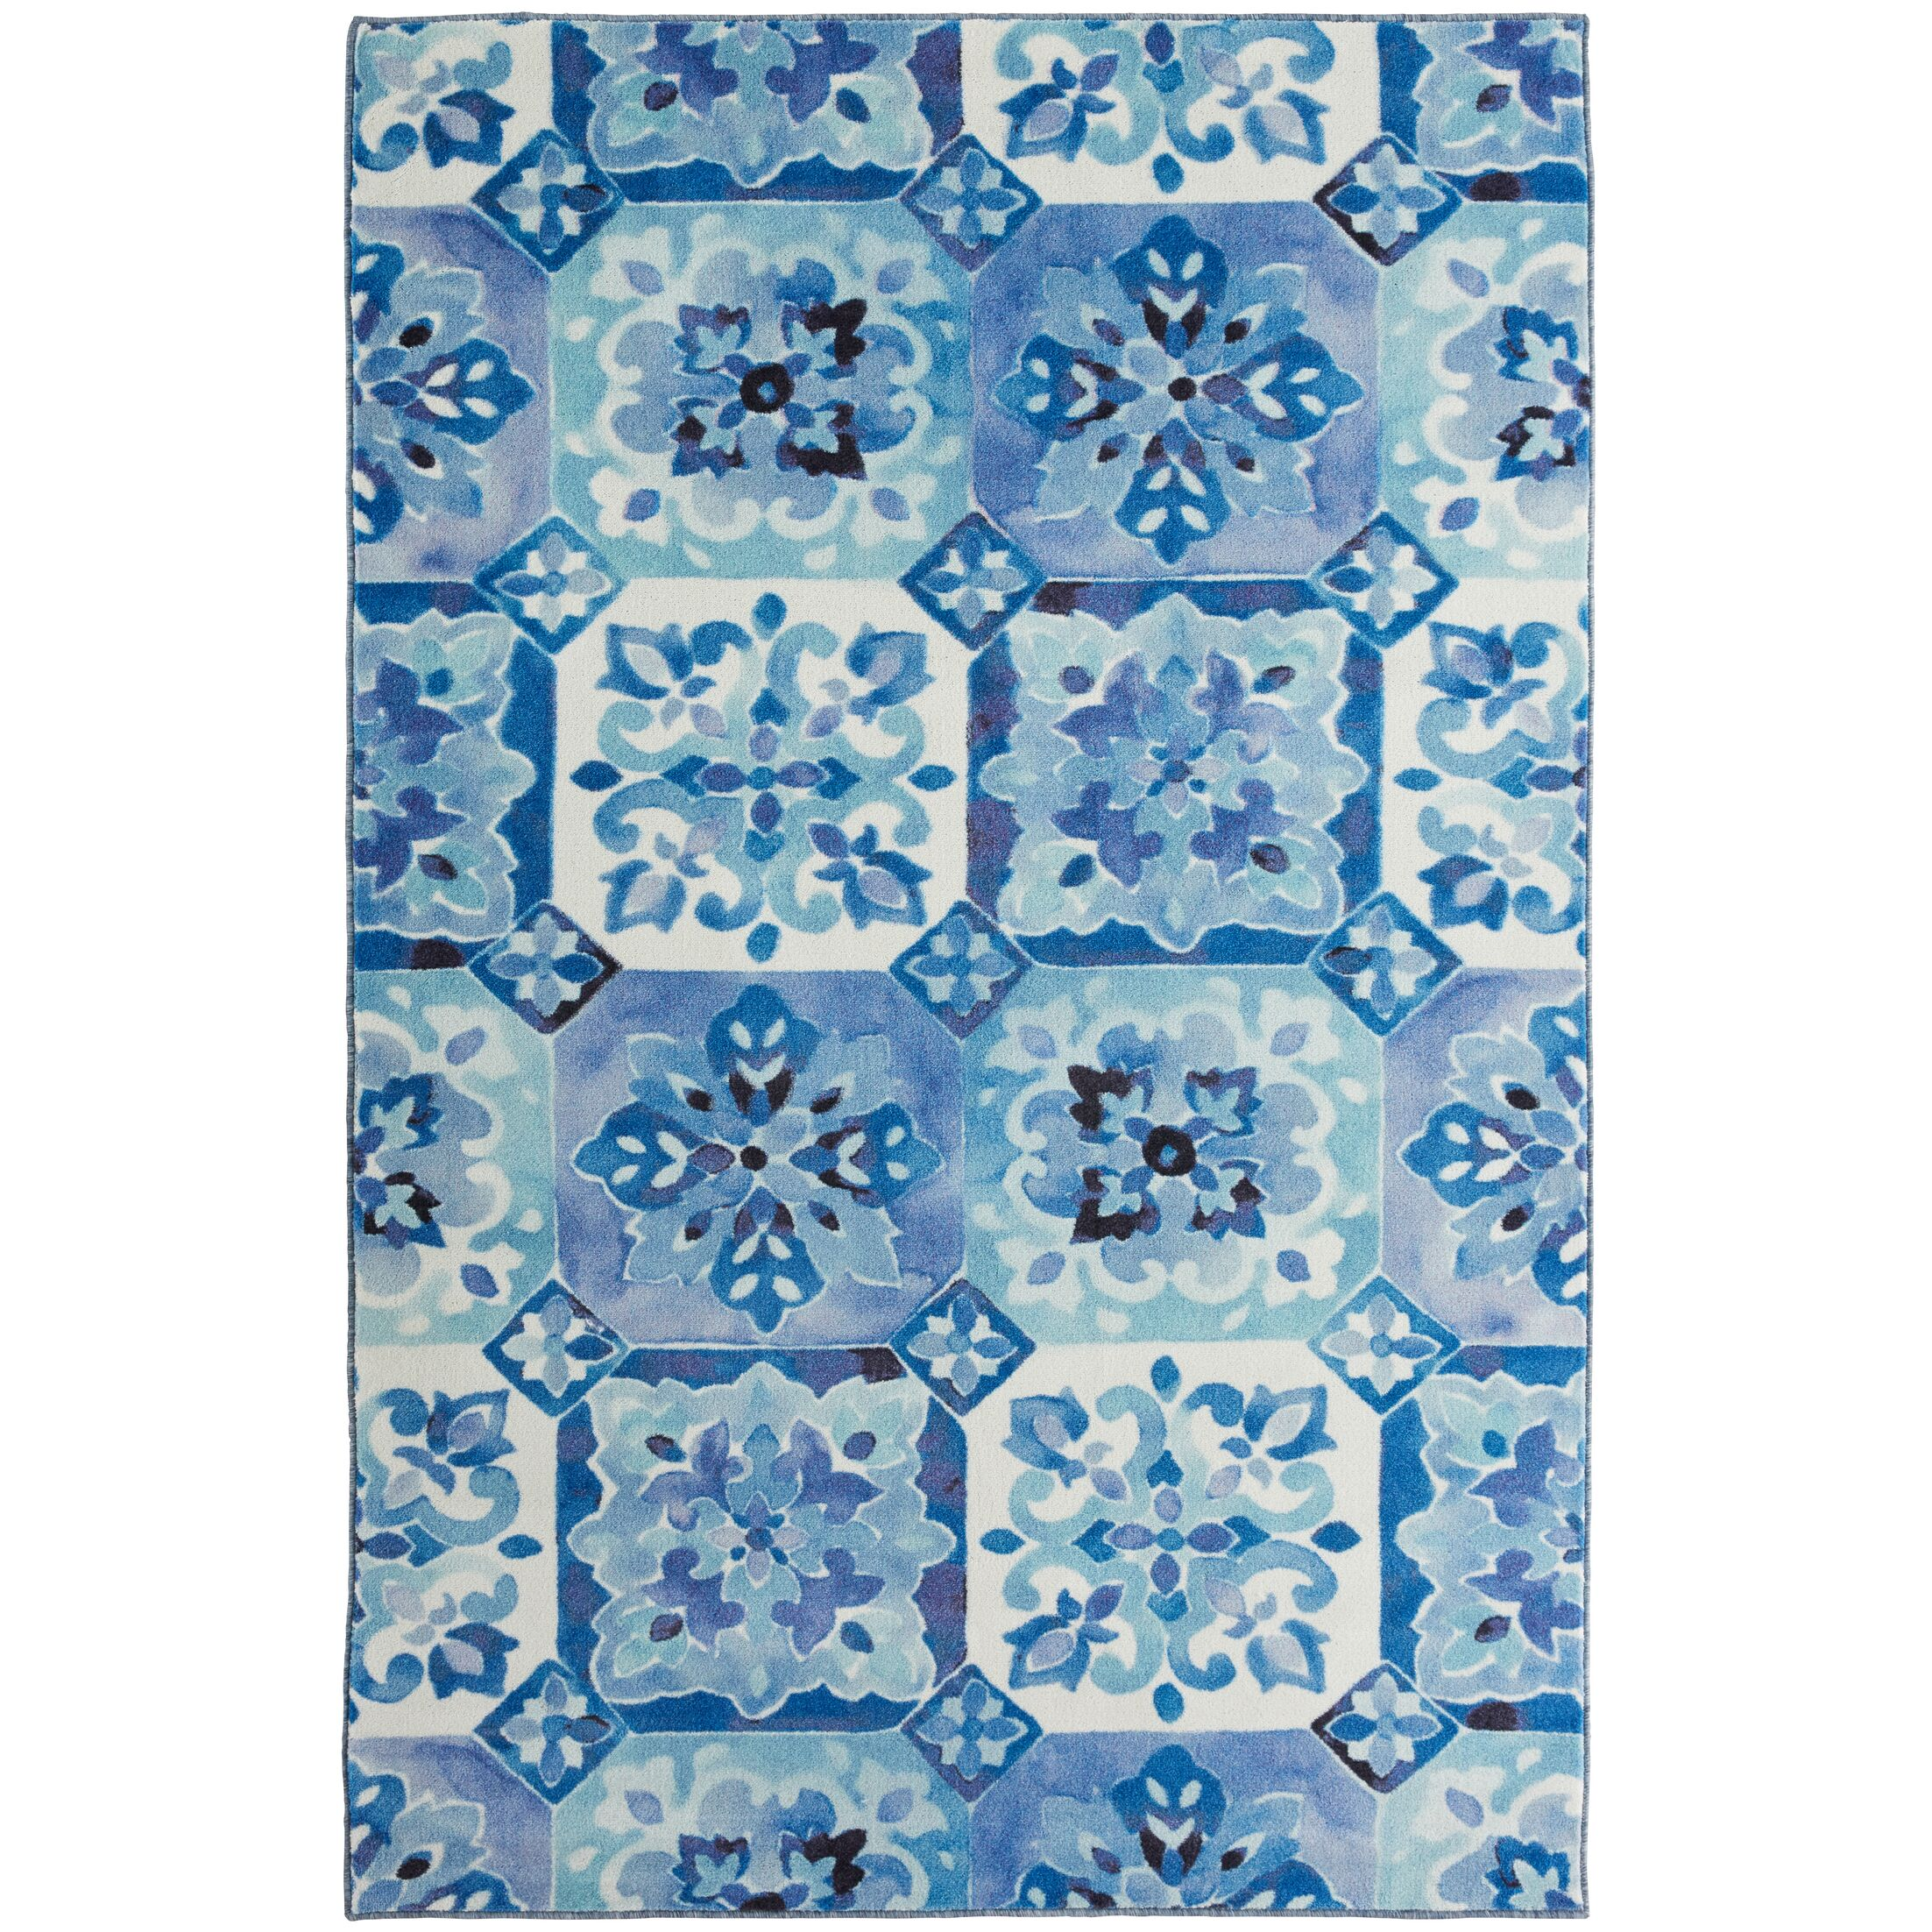 Amblewood Painted Tile Blue/White Area Rug Rug Size: Rectangle 5' x 8'